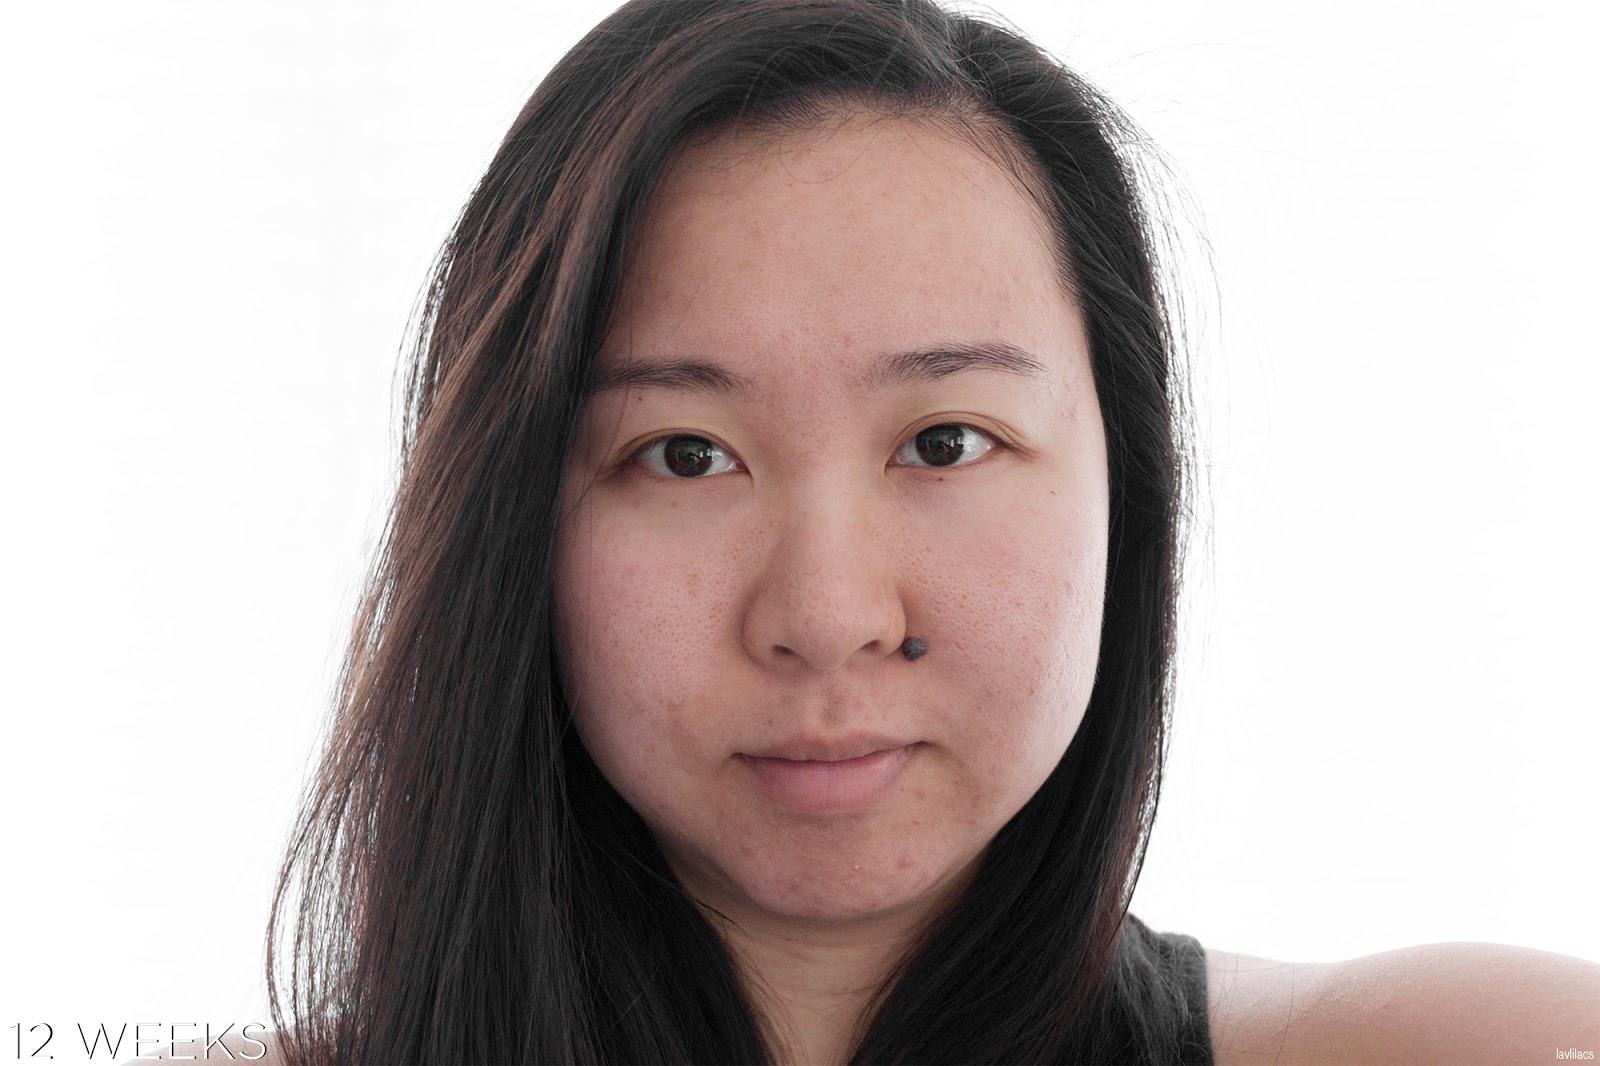 tria Hair Removal Laser Facial Hair 12 Weeks